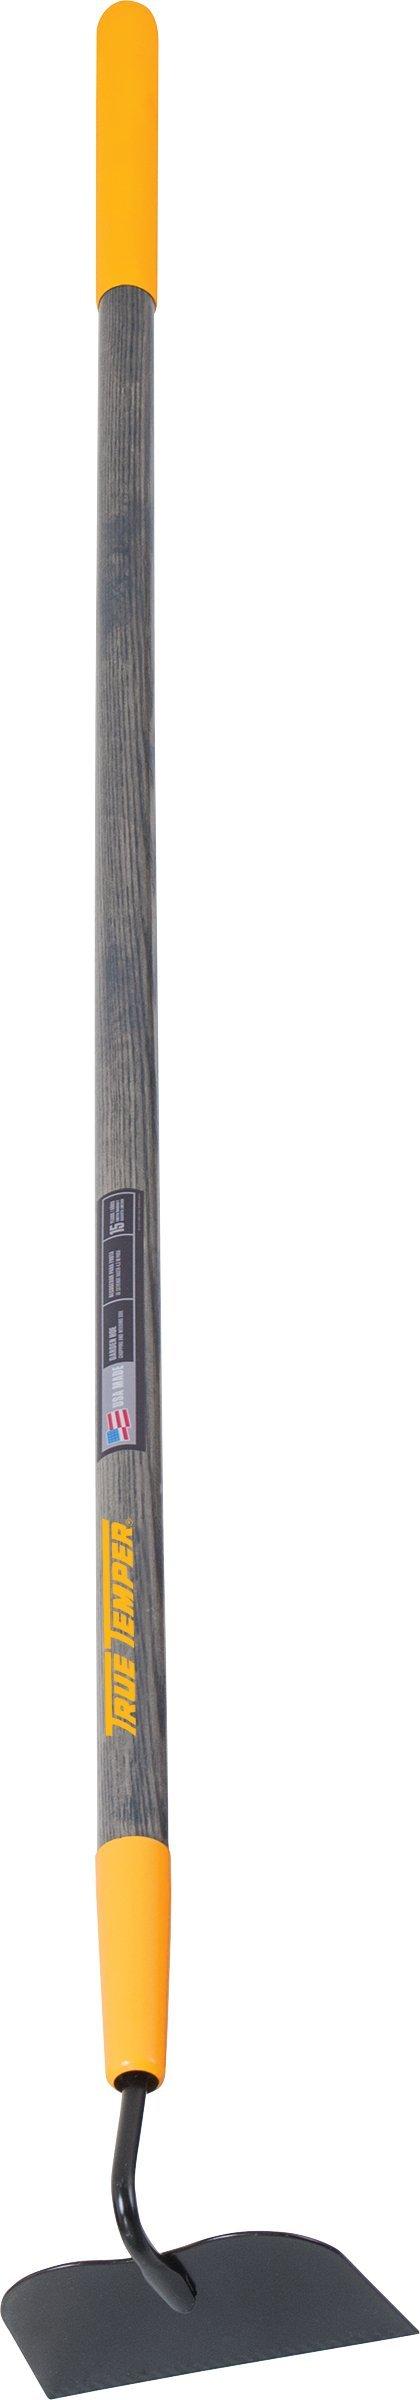 The AMES Companies,Inc True Temper Garden Hoe with Hardwood Handle - 26099900